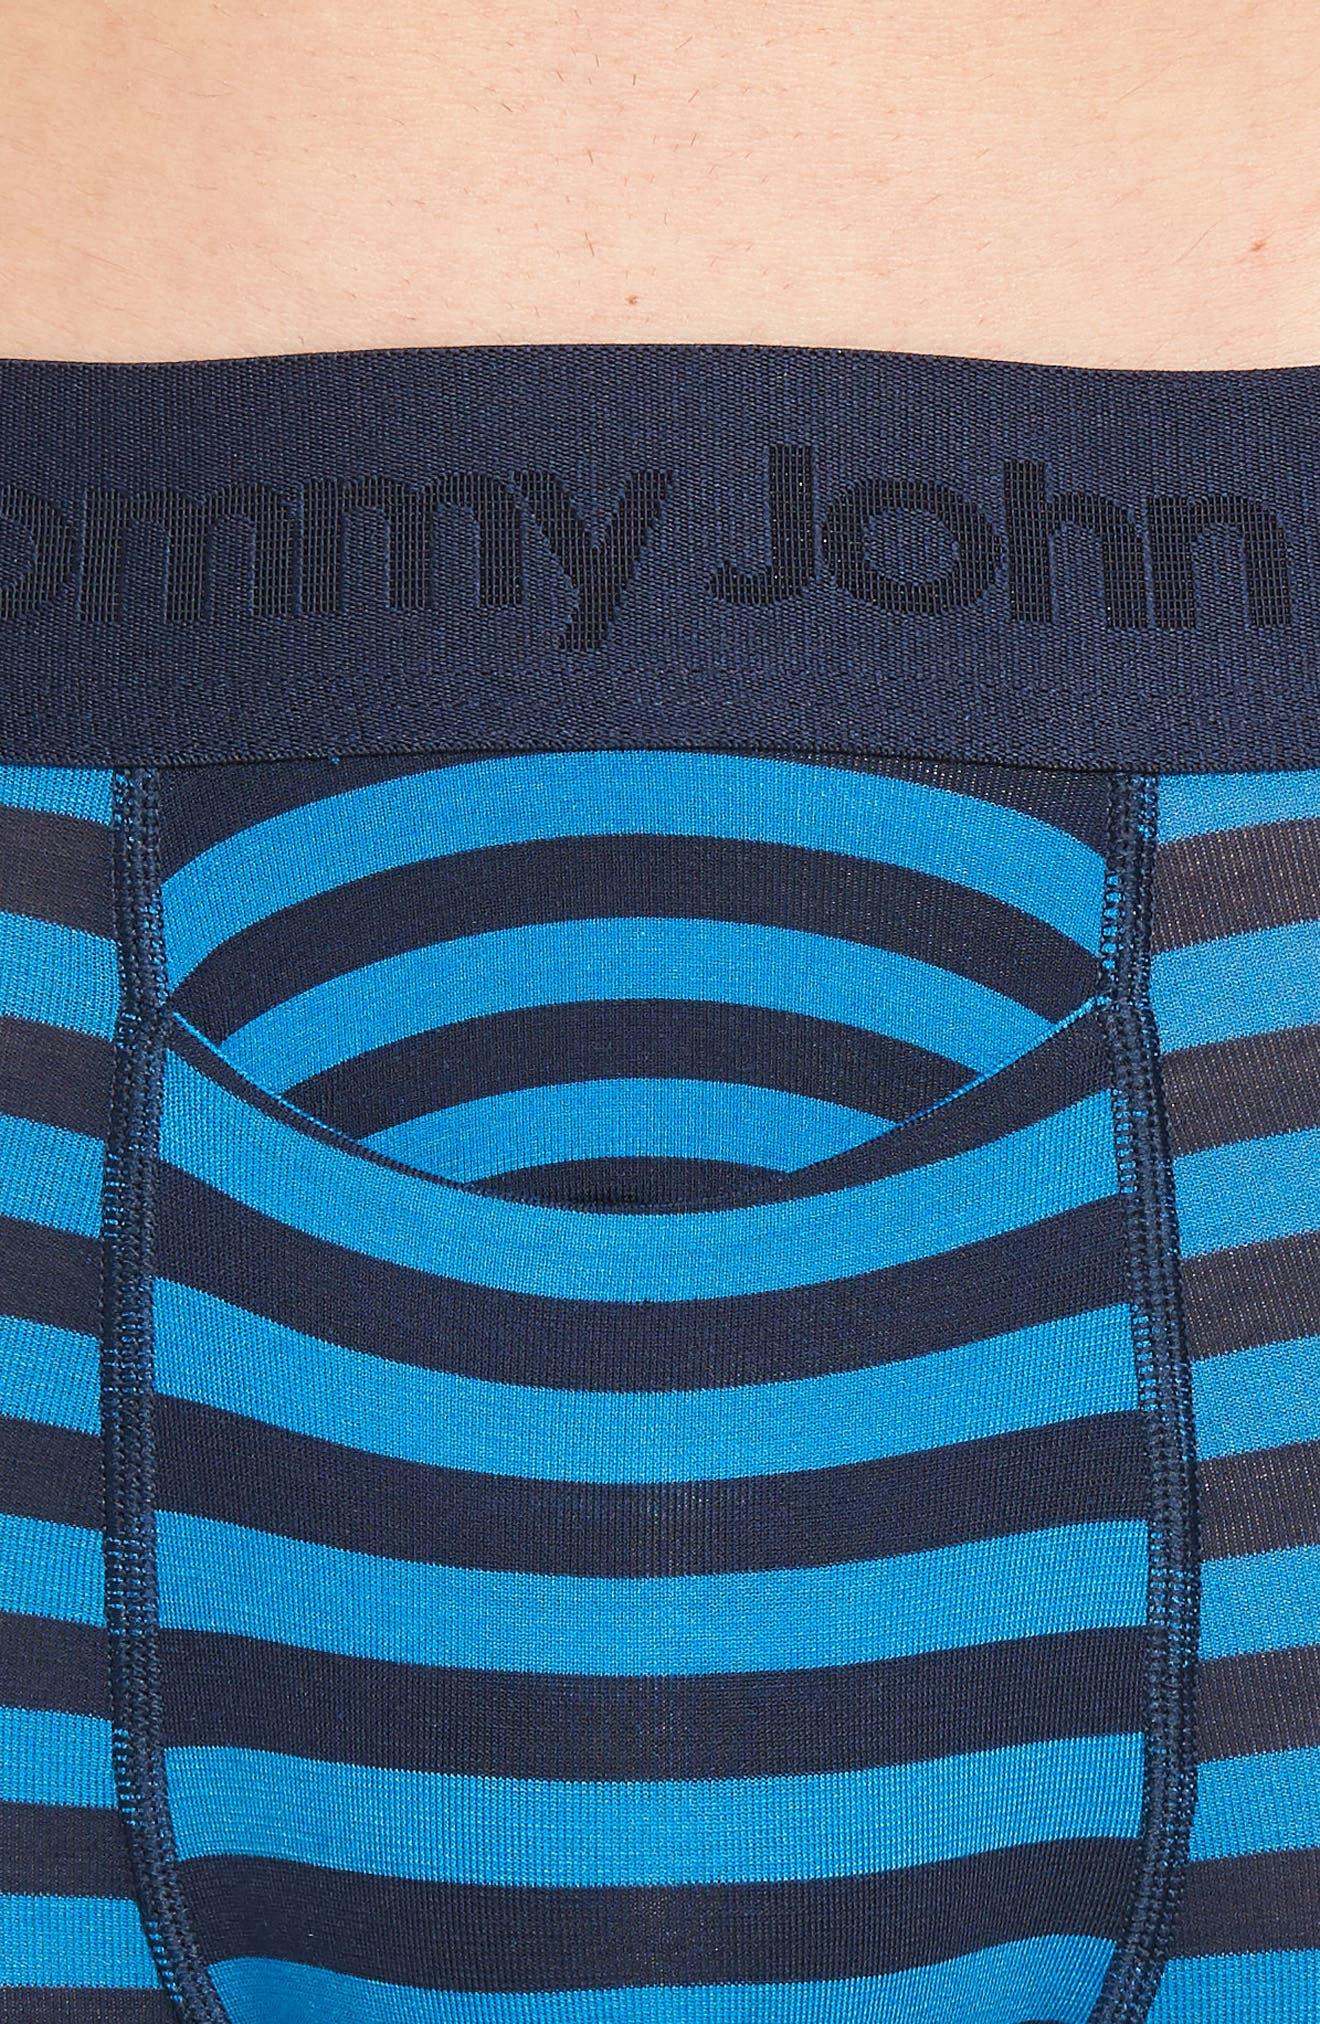 Second Skin Trunks,                             Alternate thumbnail 4, color,                             Dress Blues/ New Blue